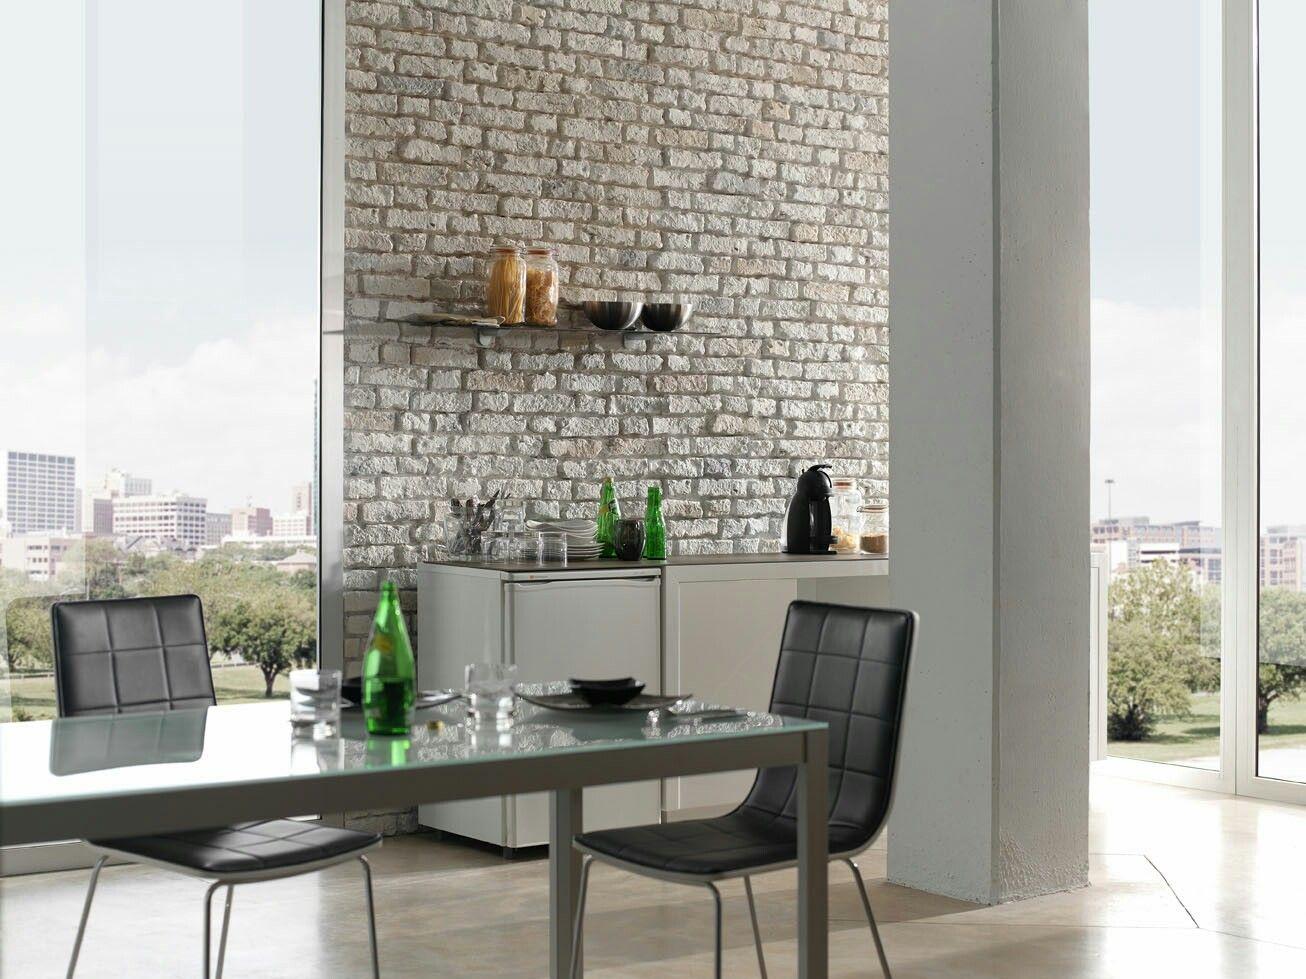 Panel ladrillo envejecido tipo loft for Imitacion ladrillo para interiores